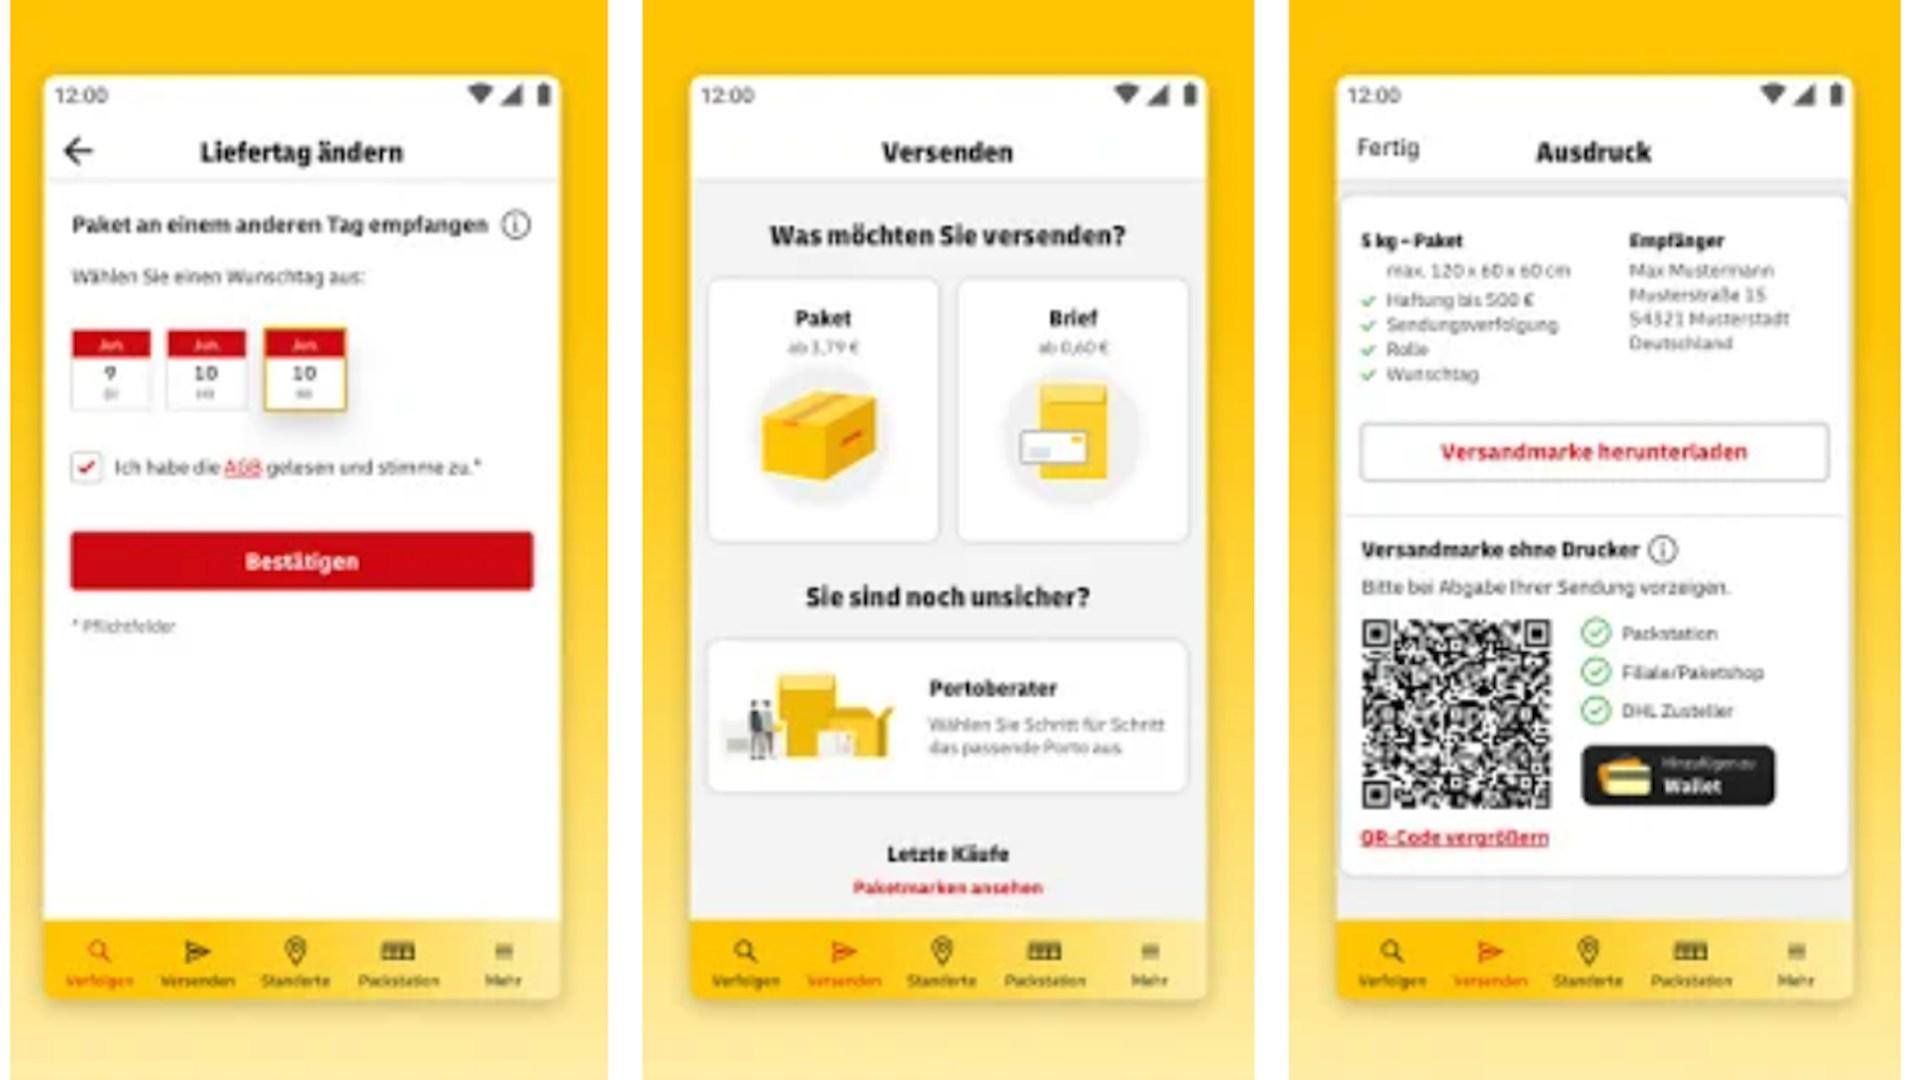 App, Porto, Post & DHL App, Briefporto